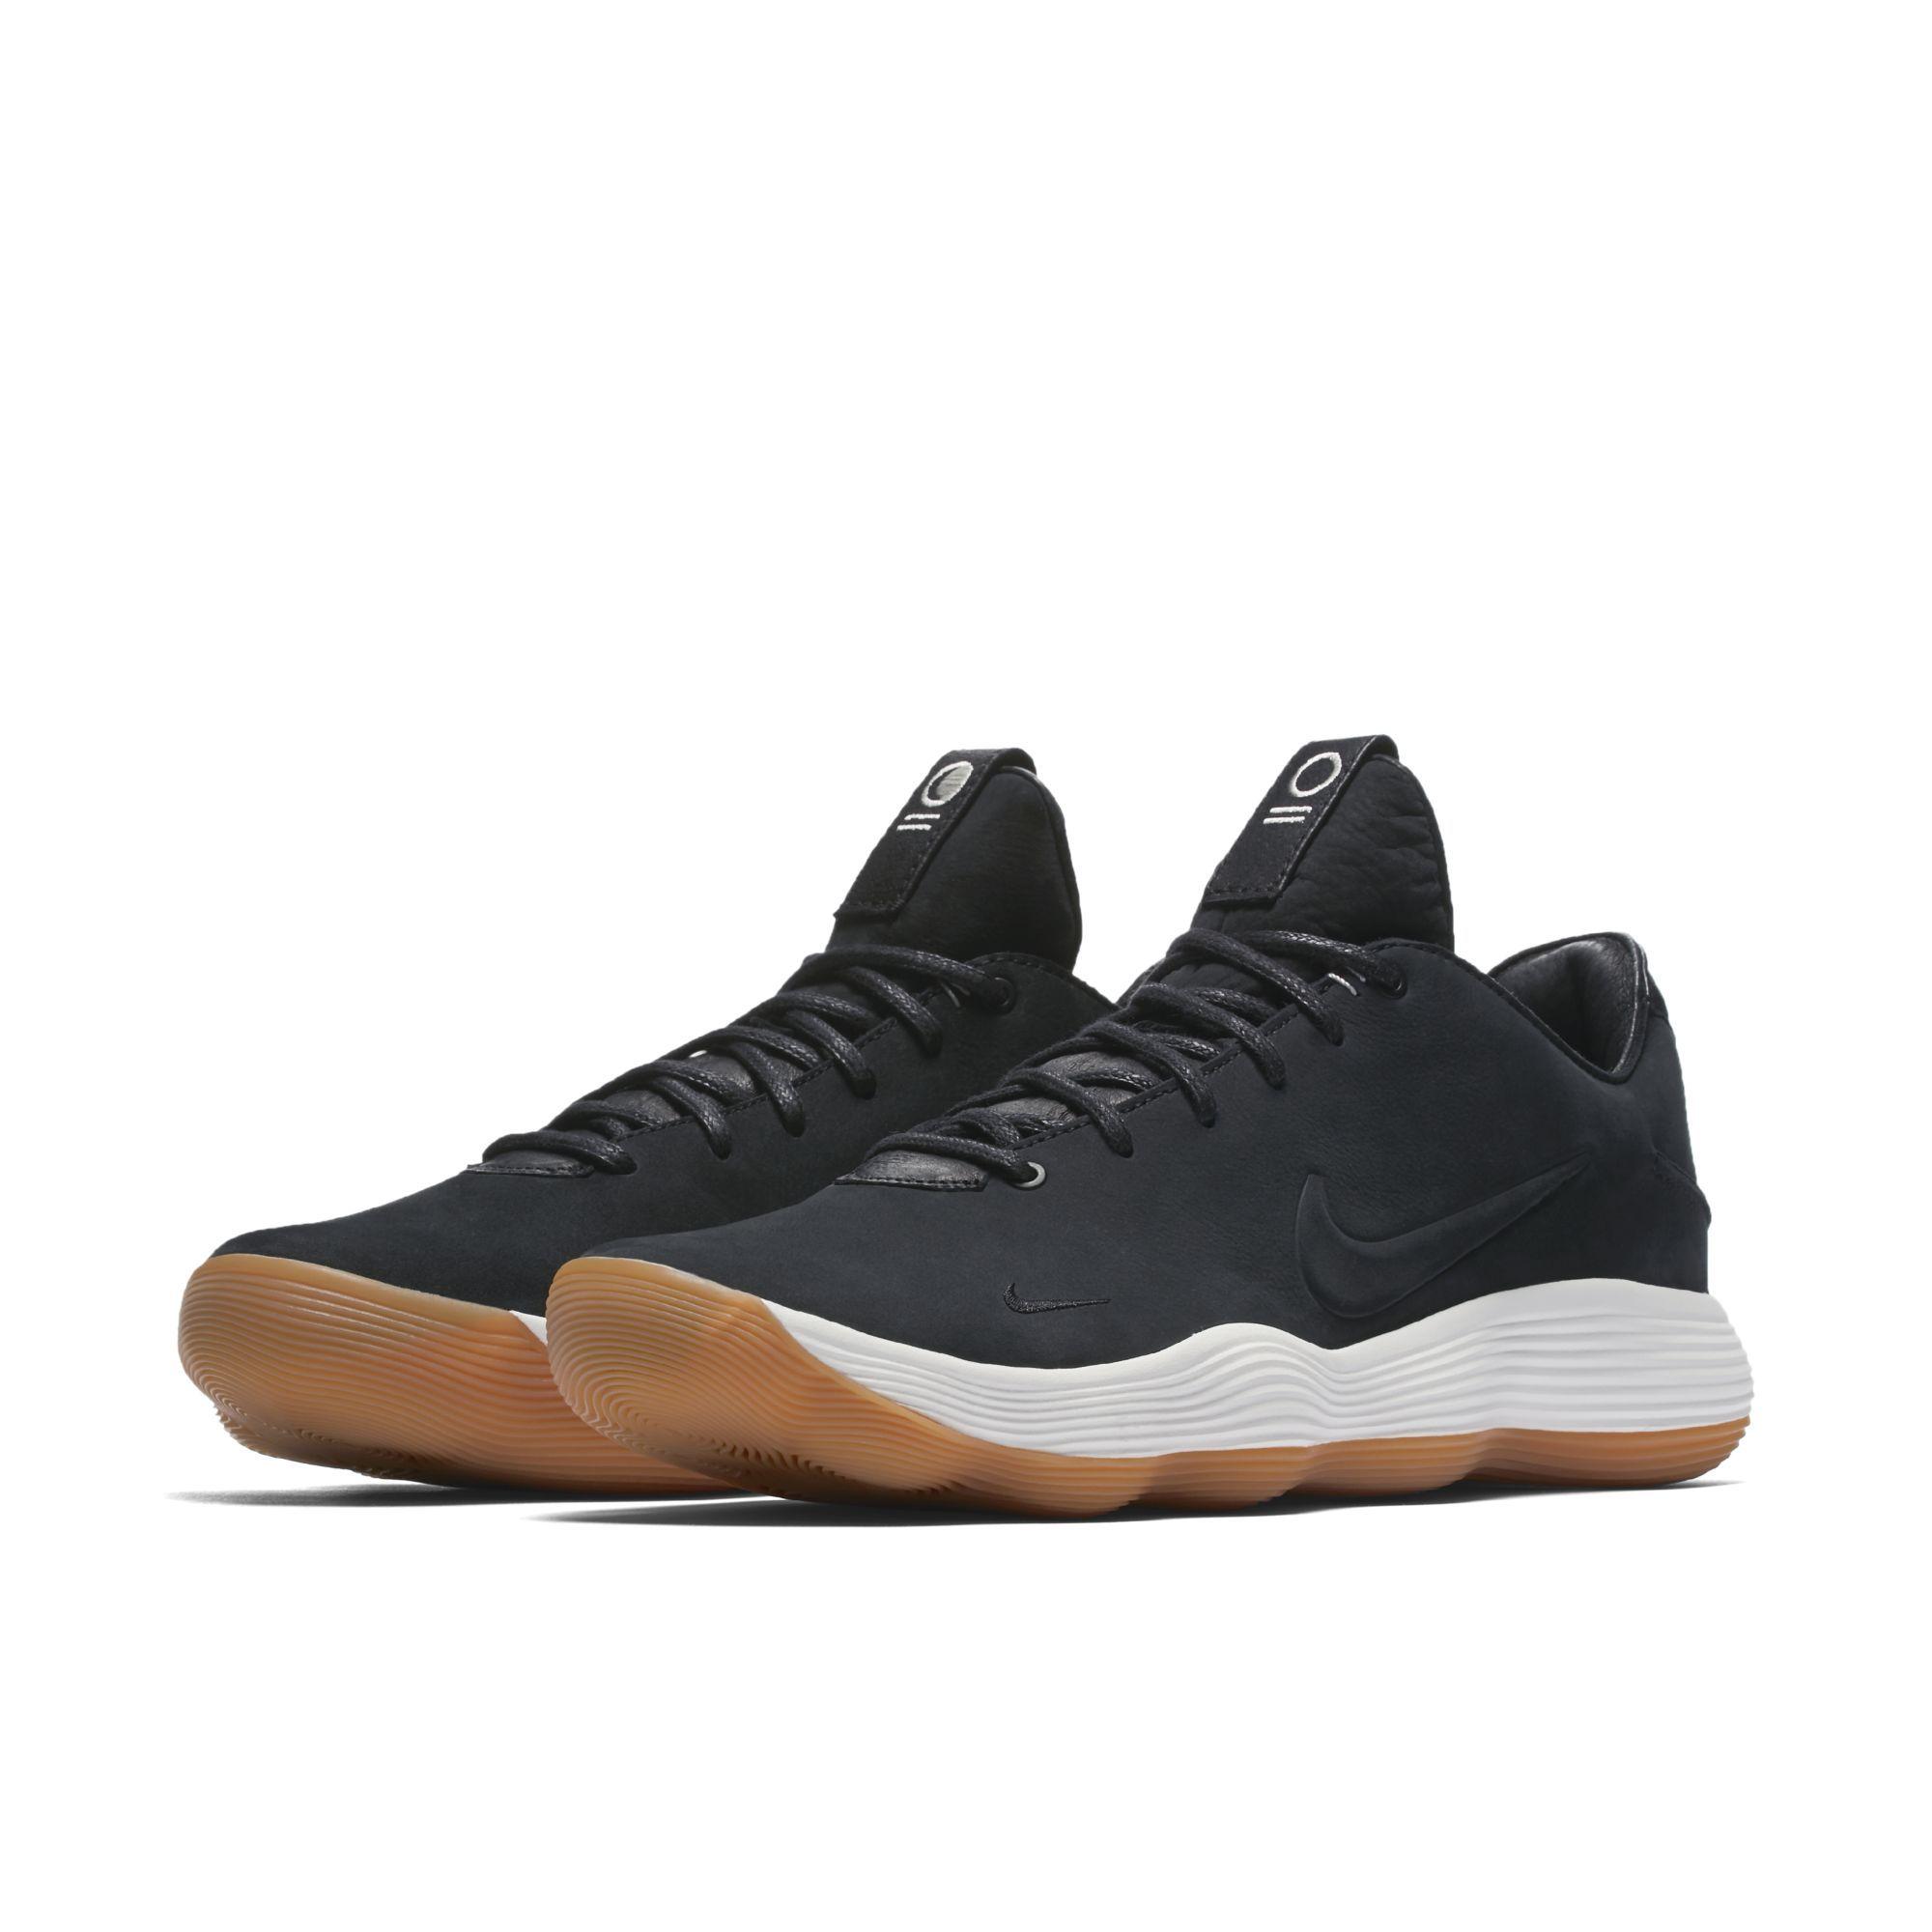 Nike React Hyperdunk 2017 low suede black